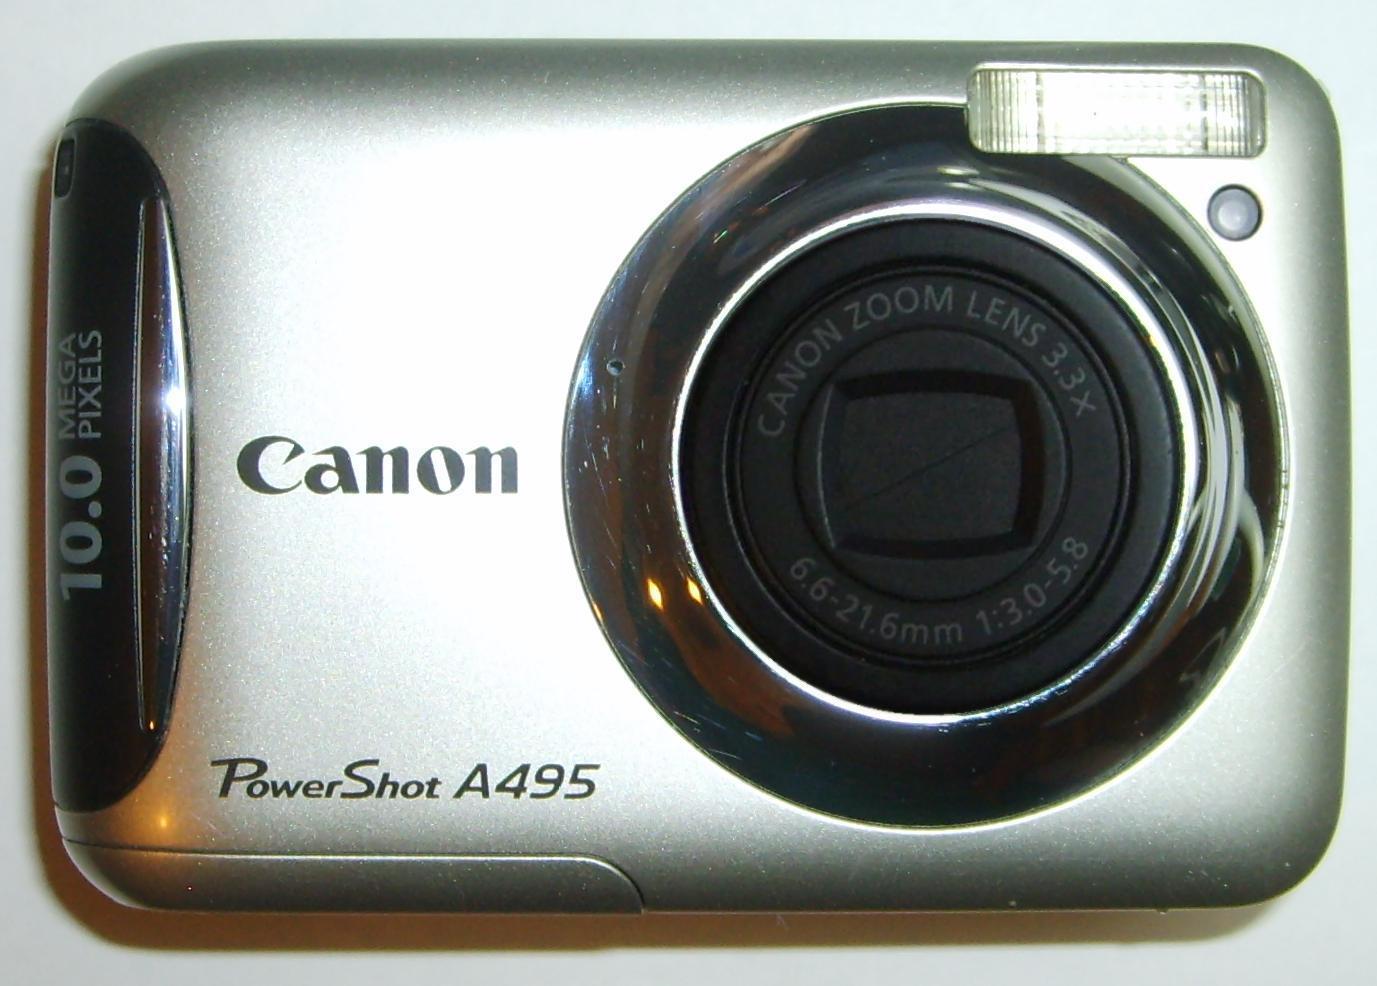 file canon powershot a495 jpg wikimedia commons rh commons wikimedia org Blue Canon PowerShot A495 Blue Canon PowerShot A495